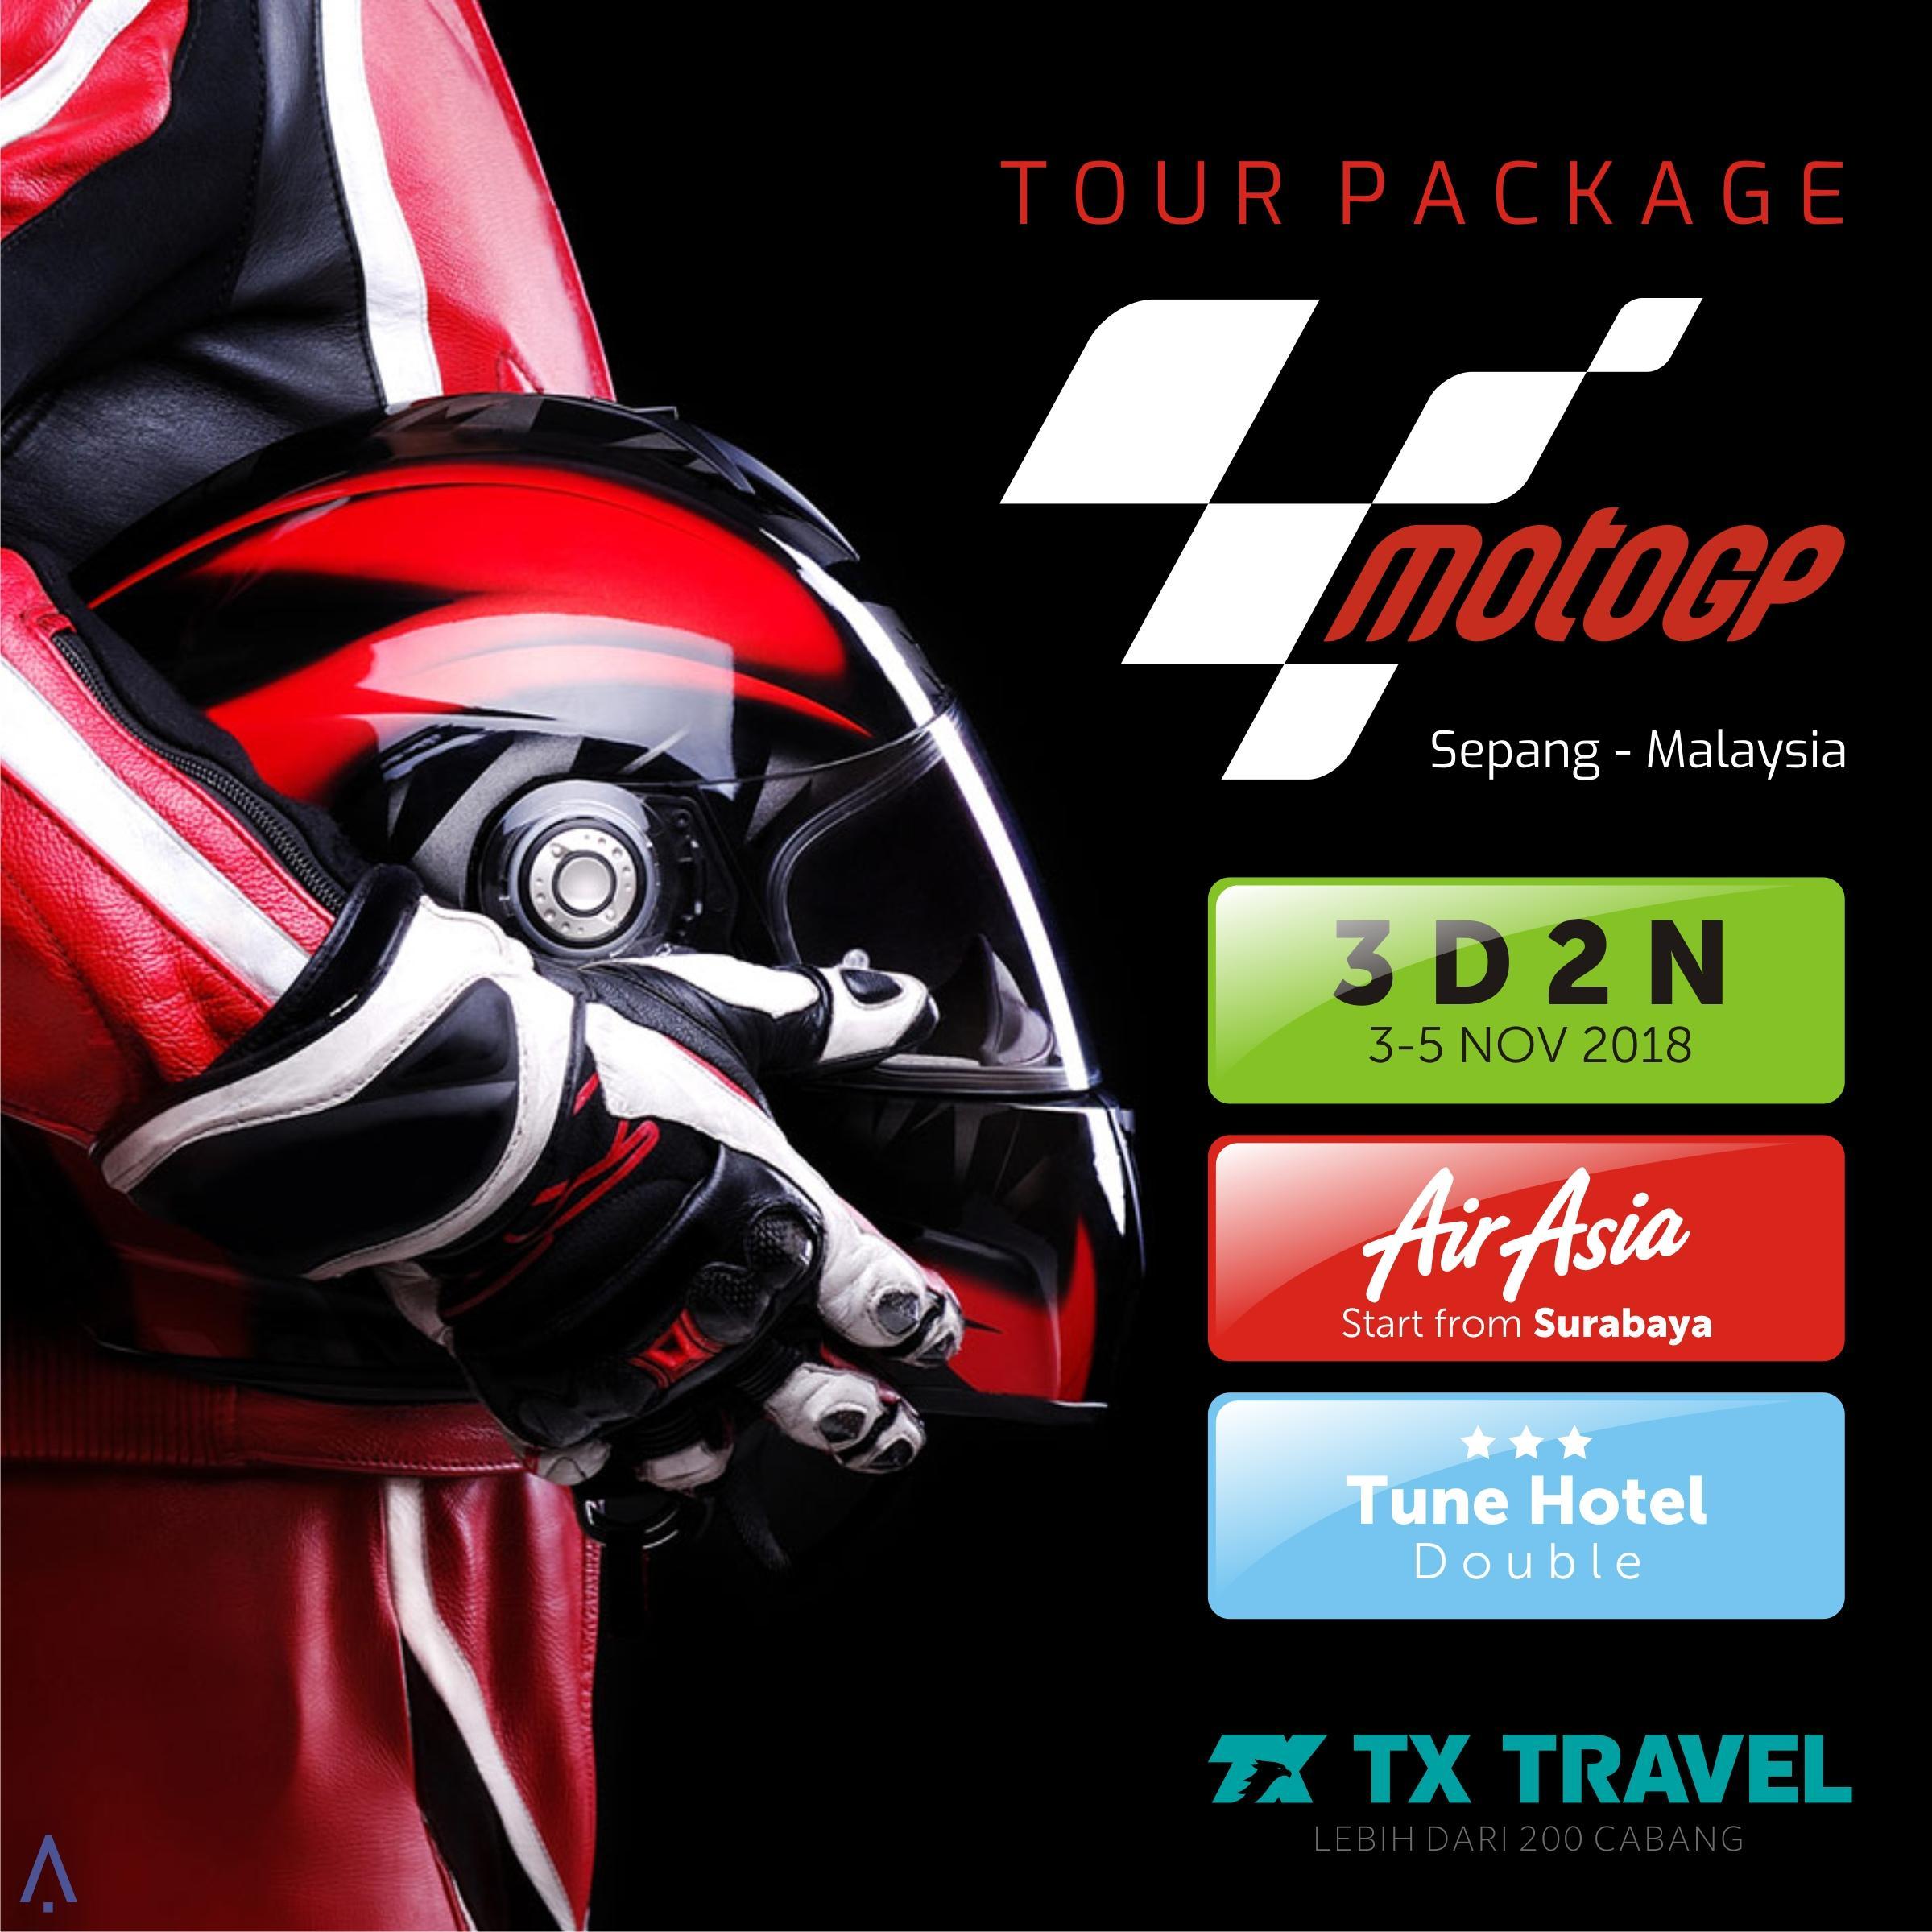 Paket Tur Murah MotoGP Sepang 3D2N (Surabaya)/Tiket MotoGP